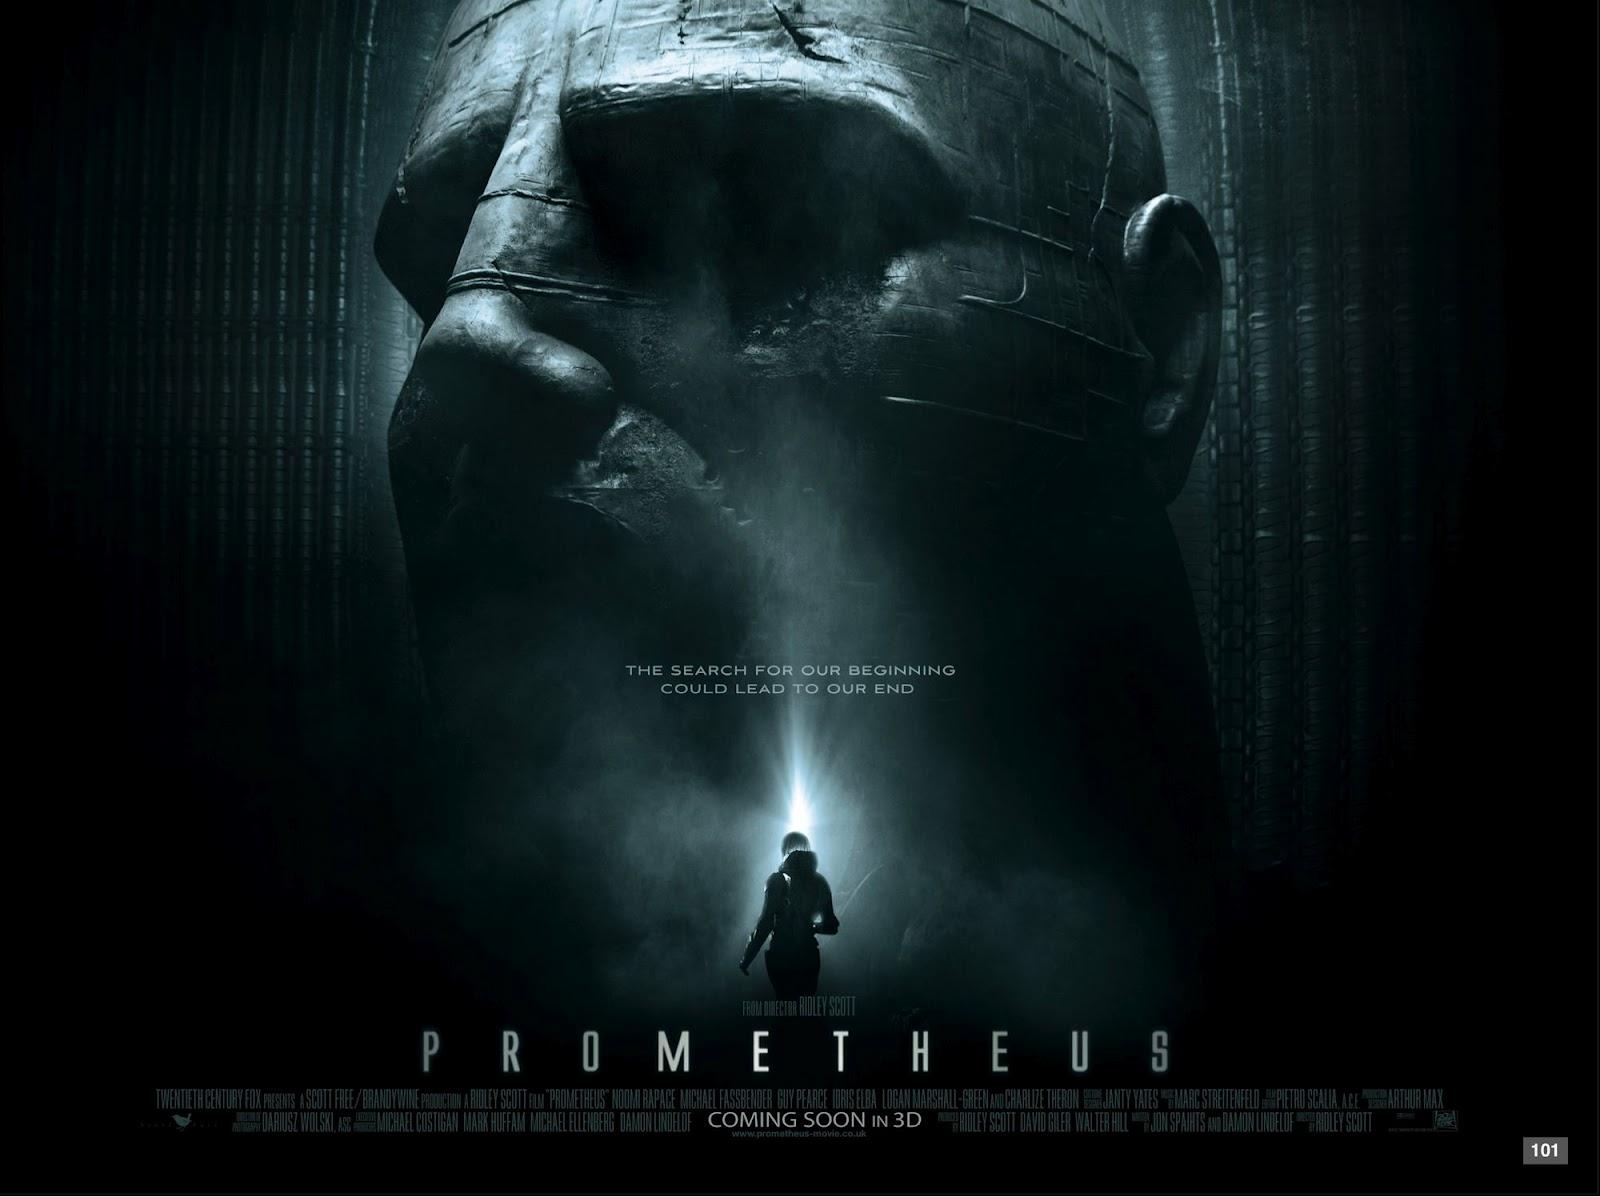 http://1.bp.blogspot.com/-LnVqRMd4CHg/T8ZDWO3924I/AAAAAAAAEaI/ryoPBgVuUsA/s1600/Prometheus-poster.jpg